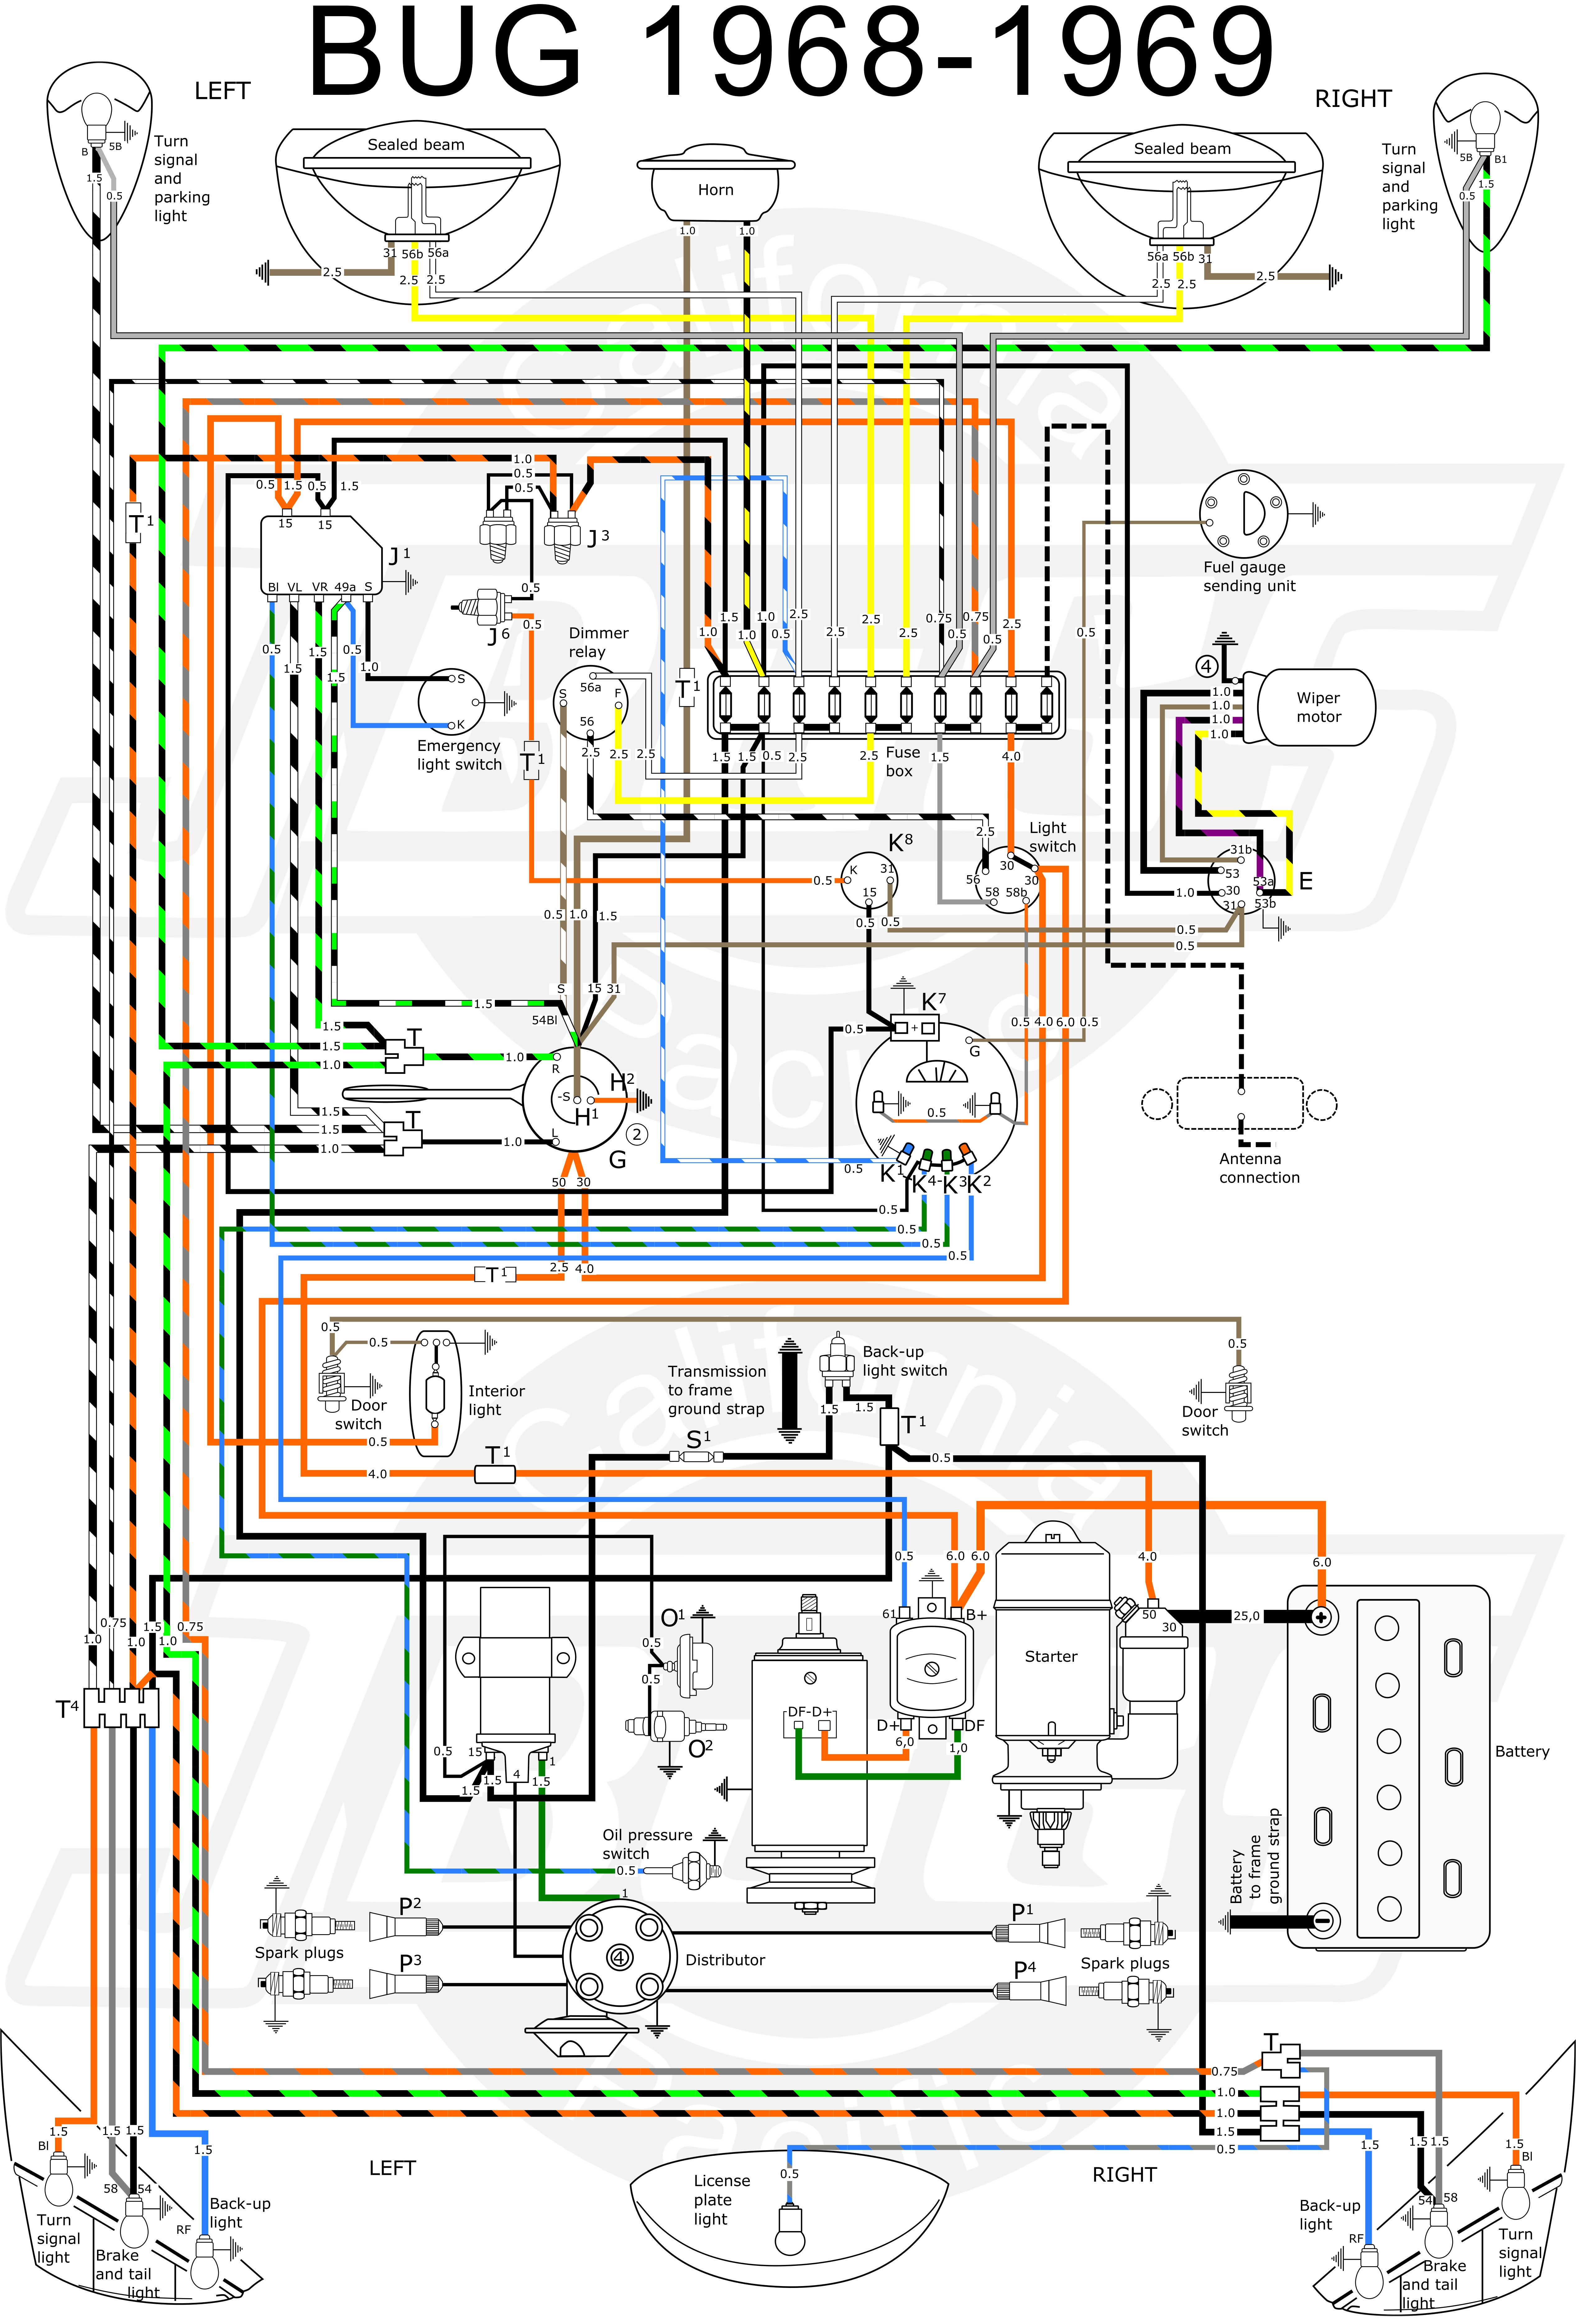 Vw Type 1 Engine Diagram Diagram Vw Bus Turn Signal Wiring Ignition Switch Wiring Diagram Vw Of Vw Type 1 Engine Diagram